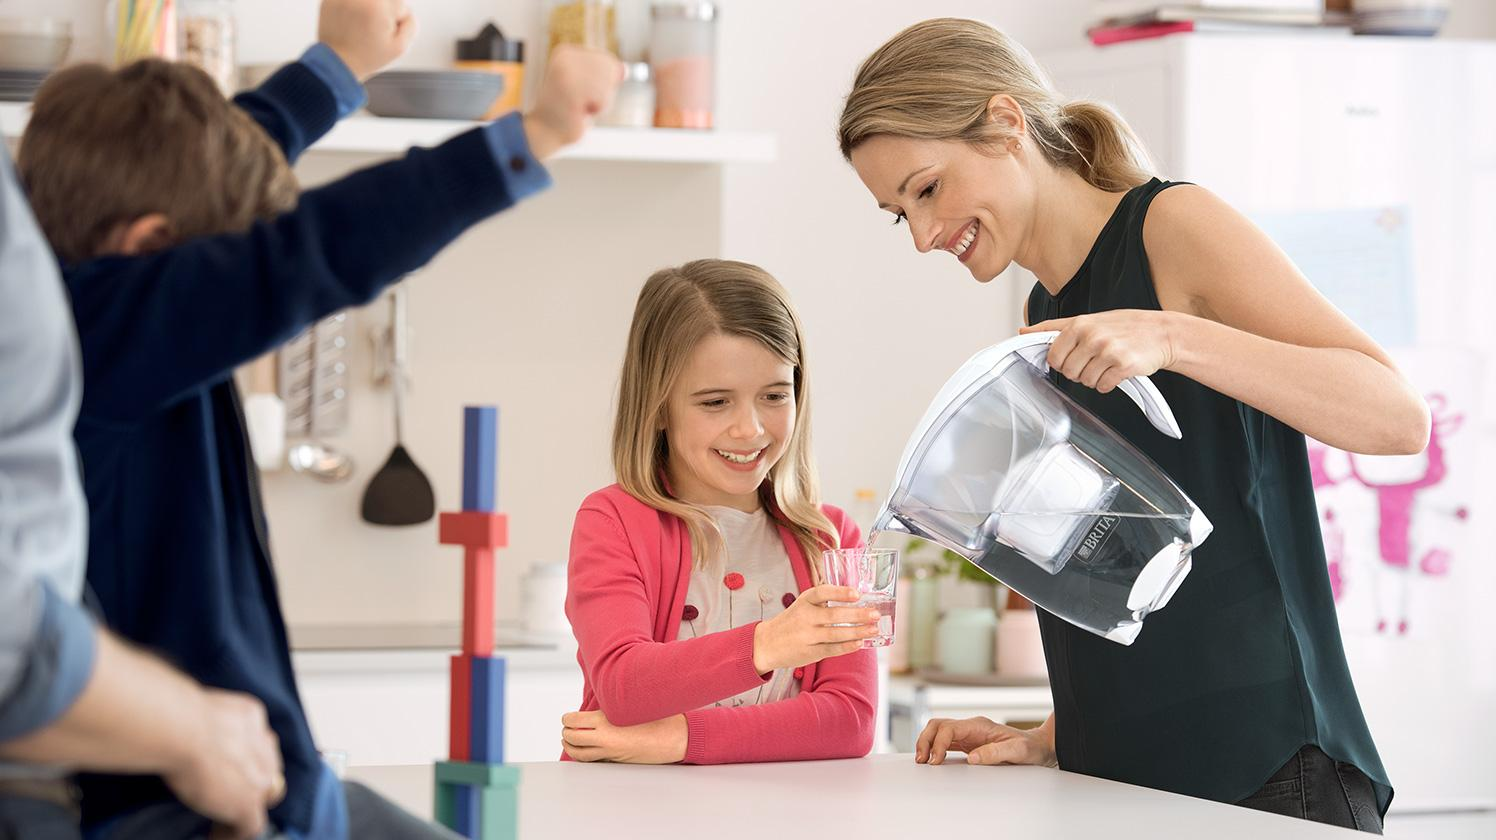 BRITA 滿足個人補水需要—家庭廚房